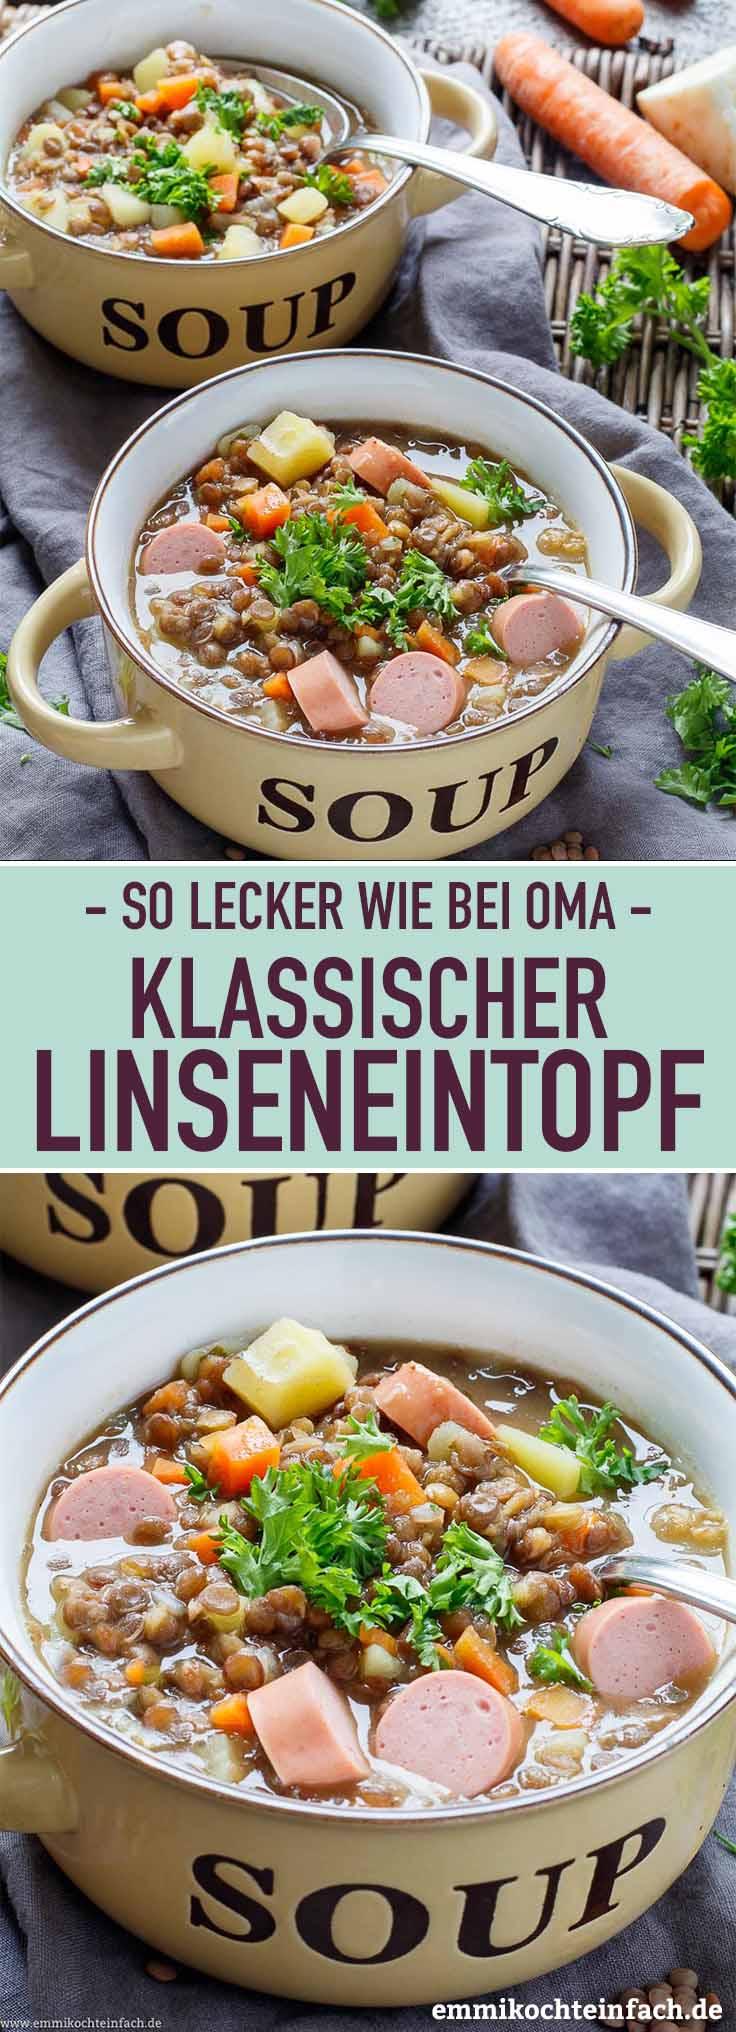 Klassischer Linseneintopf - www.emmikochteinfach.de